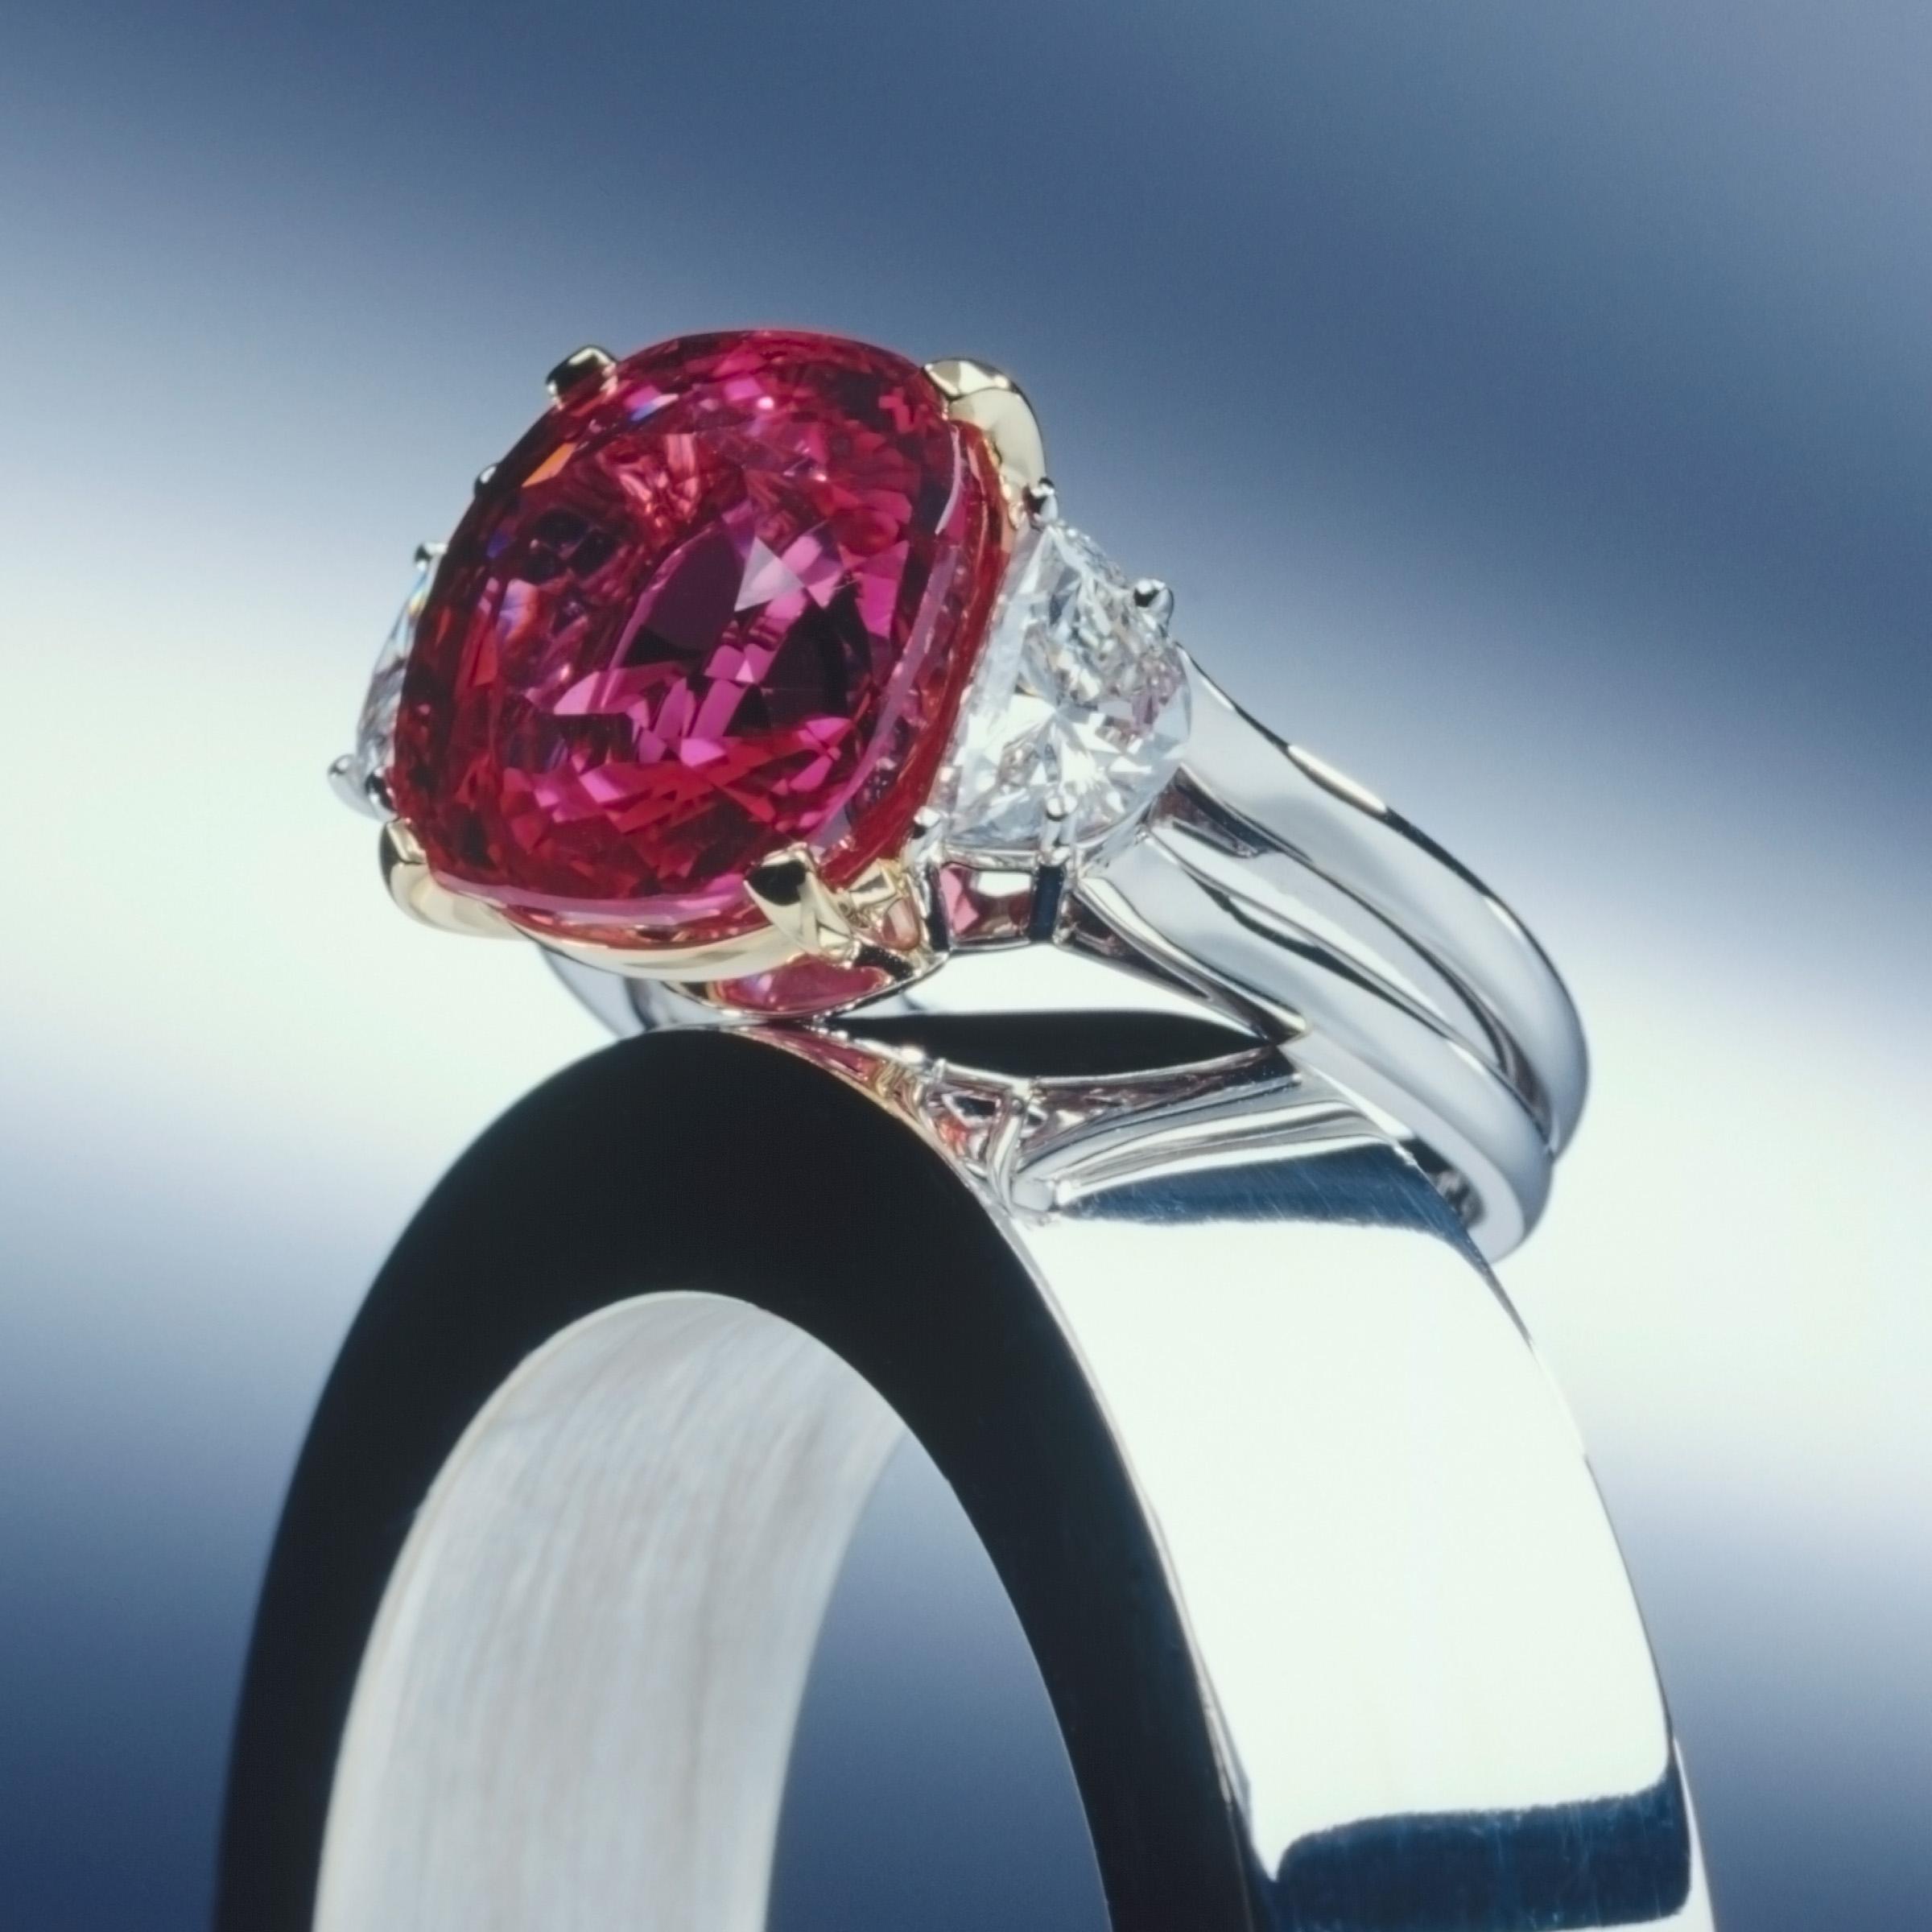 2004 Spectrum Award , Bridal Division ,Plat Guild Intl Honors  14ct Pink Sapphire